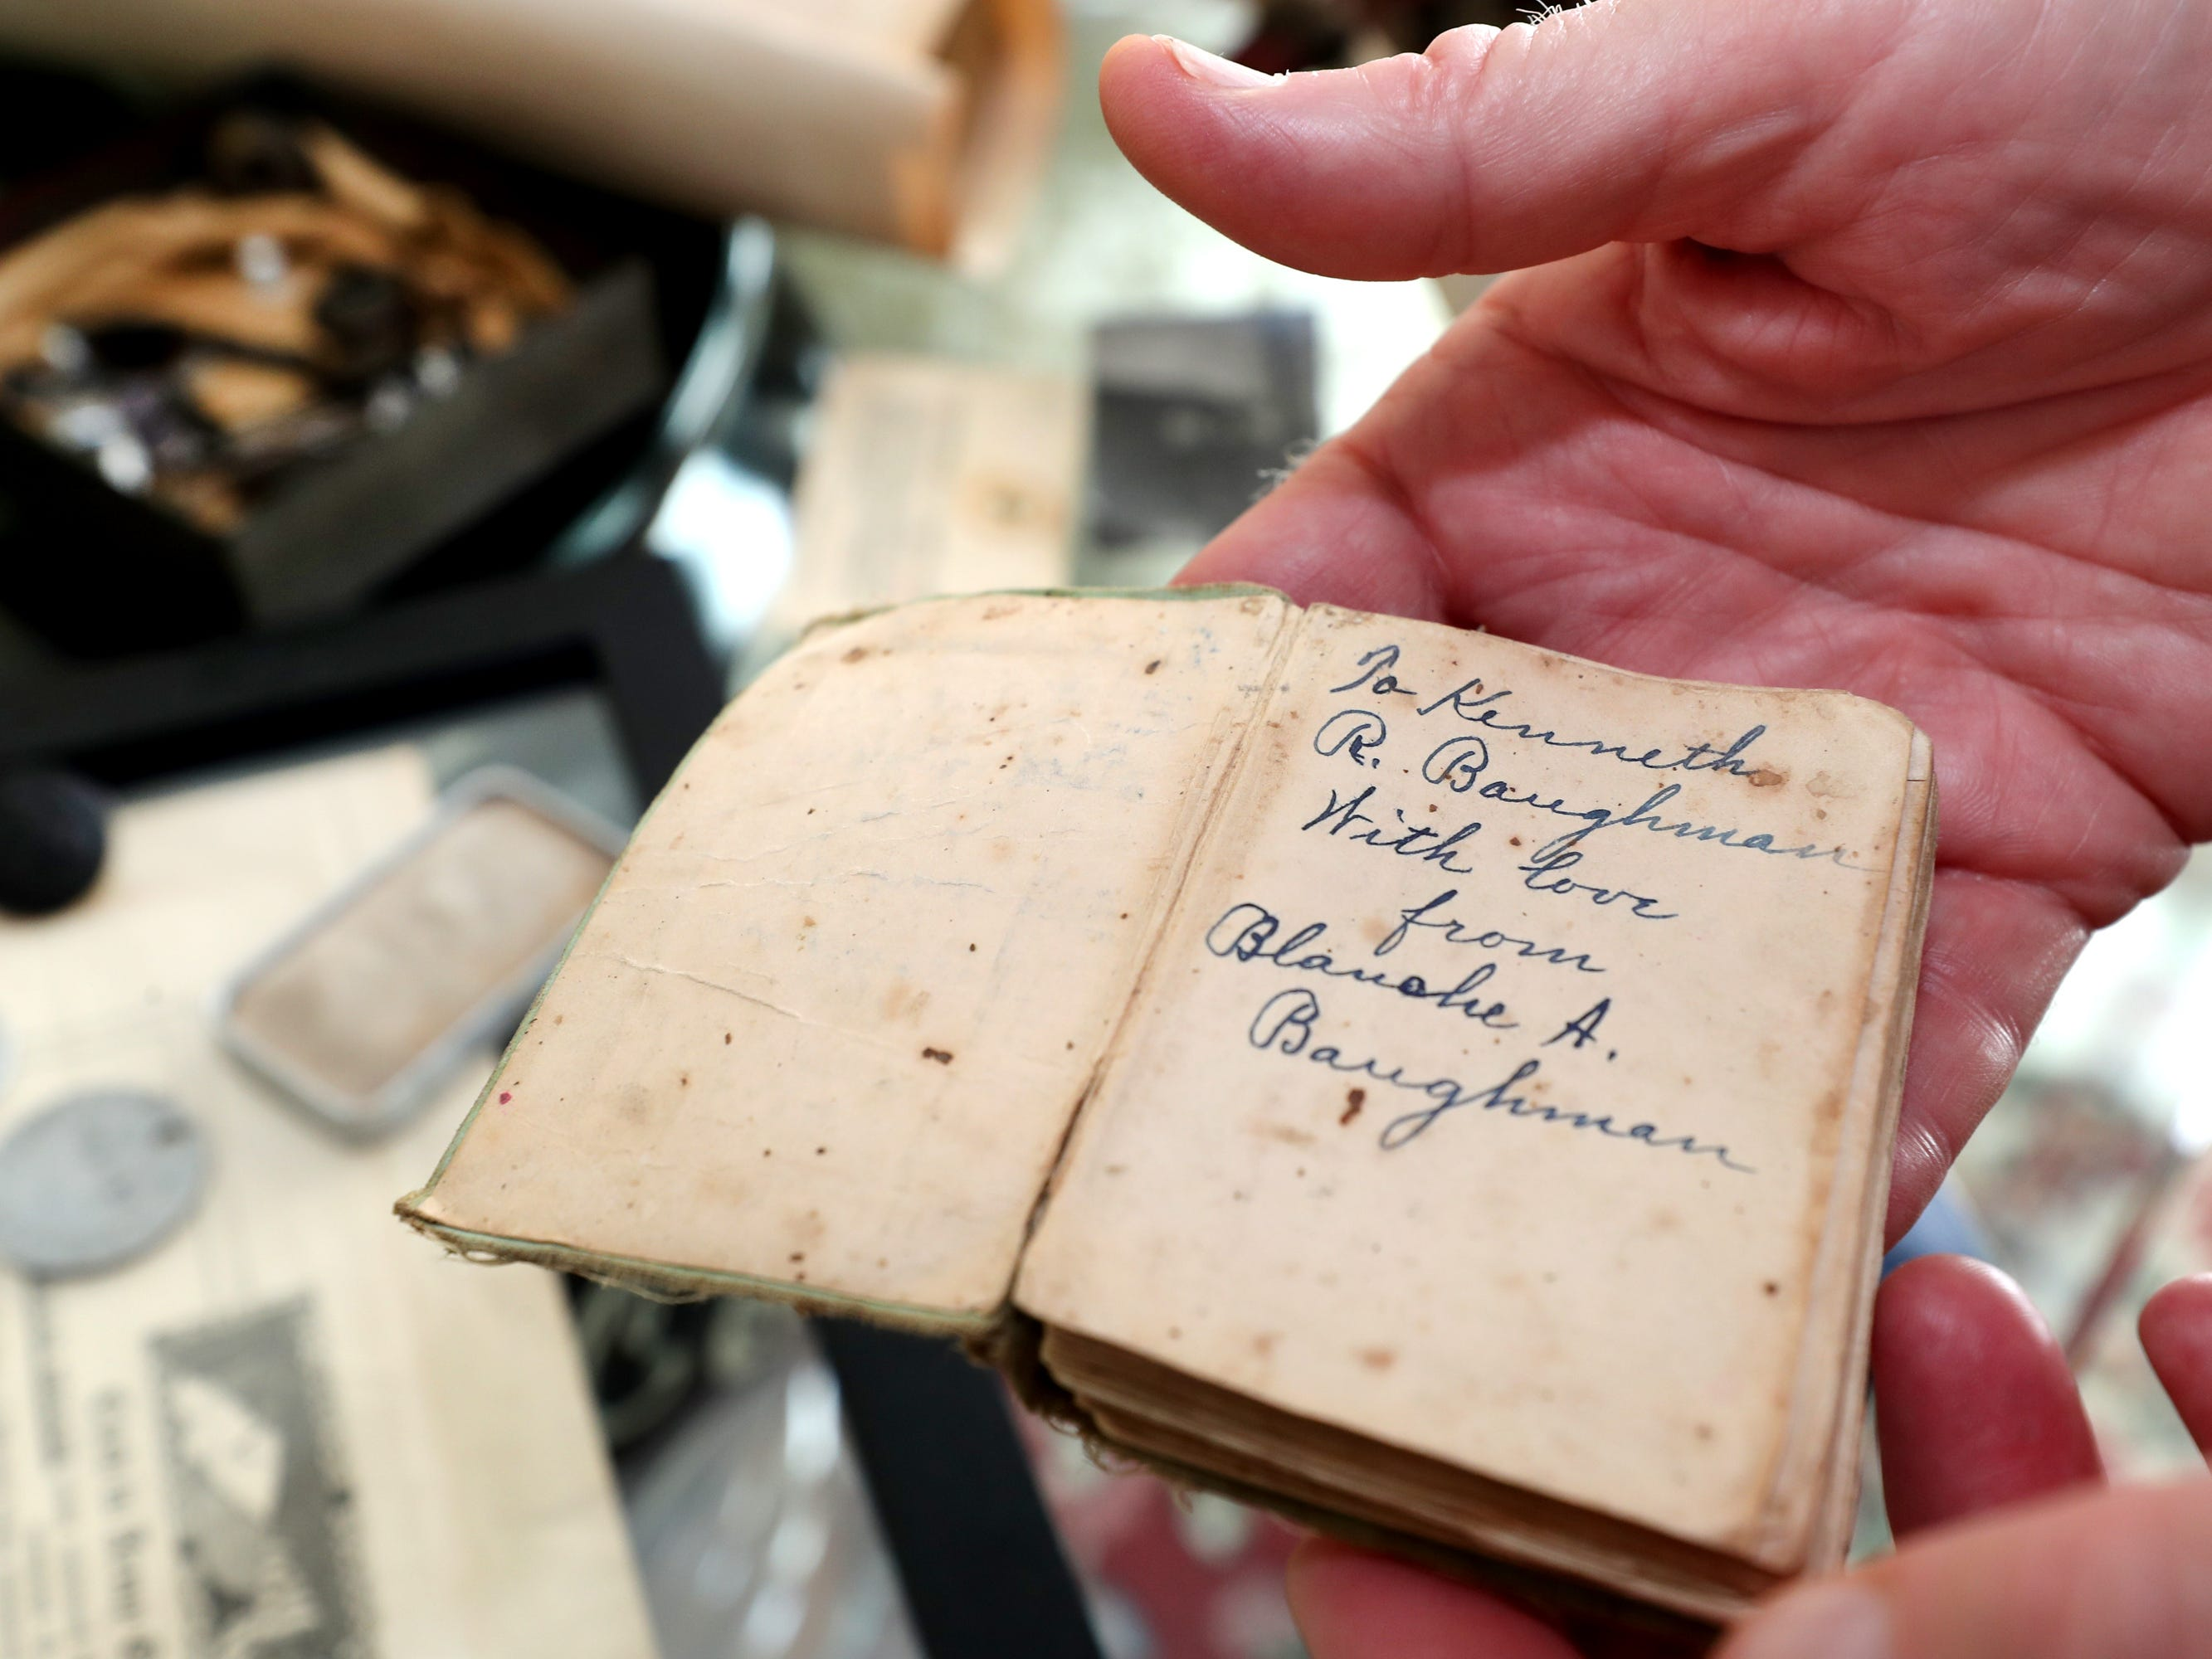 Steve Baughman show off a prayer book that his grandfather Kenneth Baughman carried during World War II,  on Monday, Nov. 5, 2018.